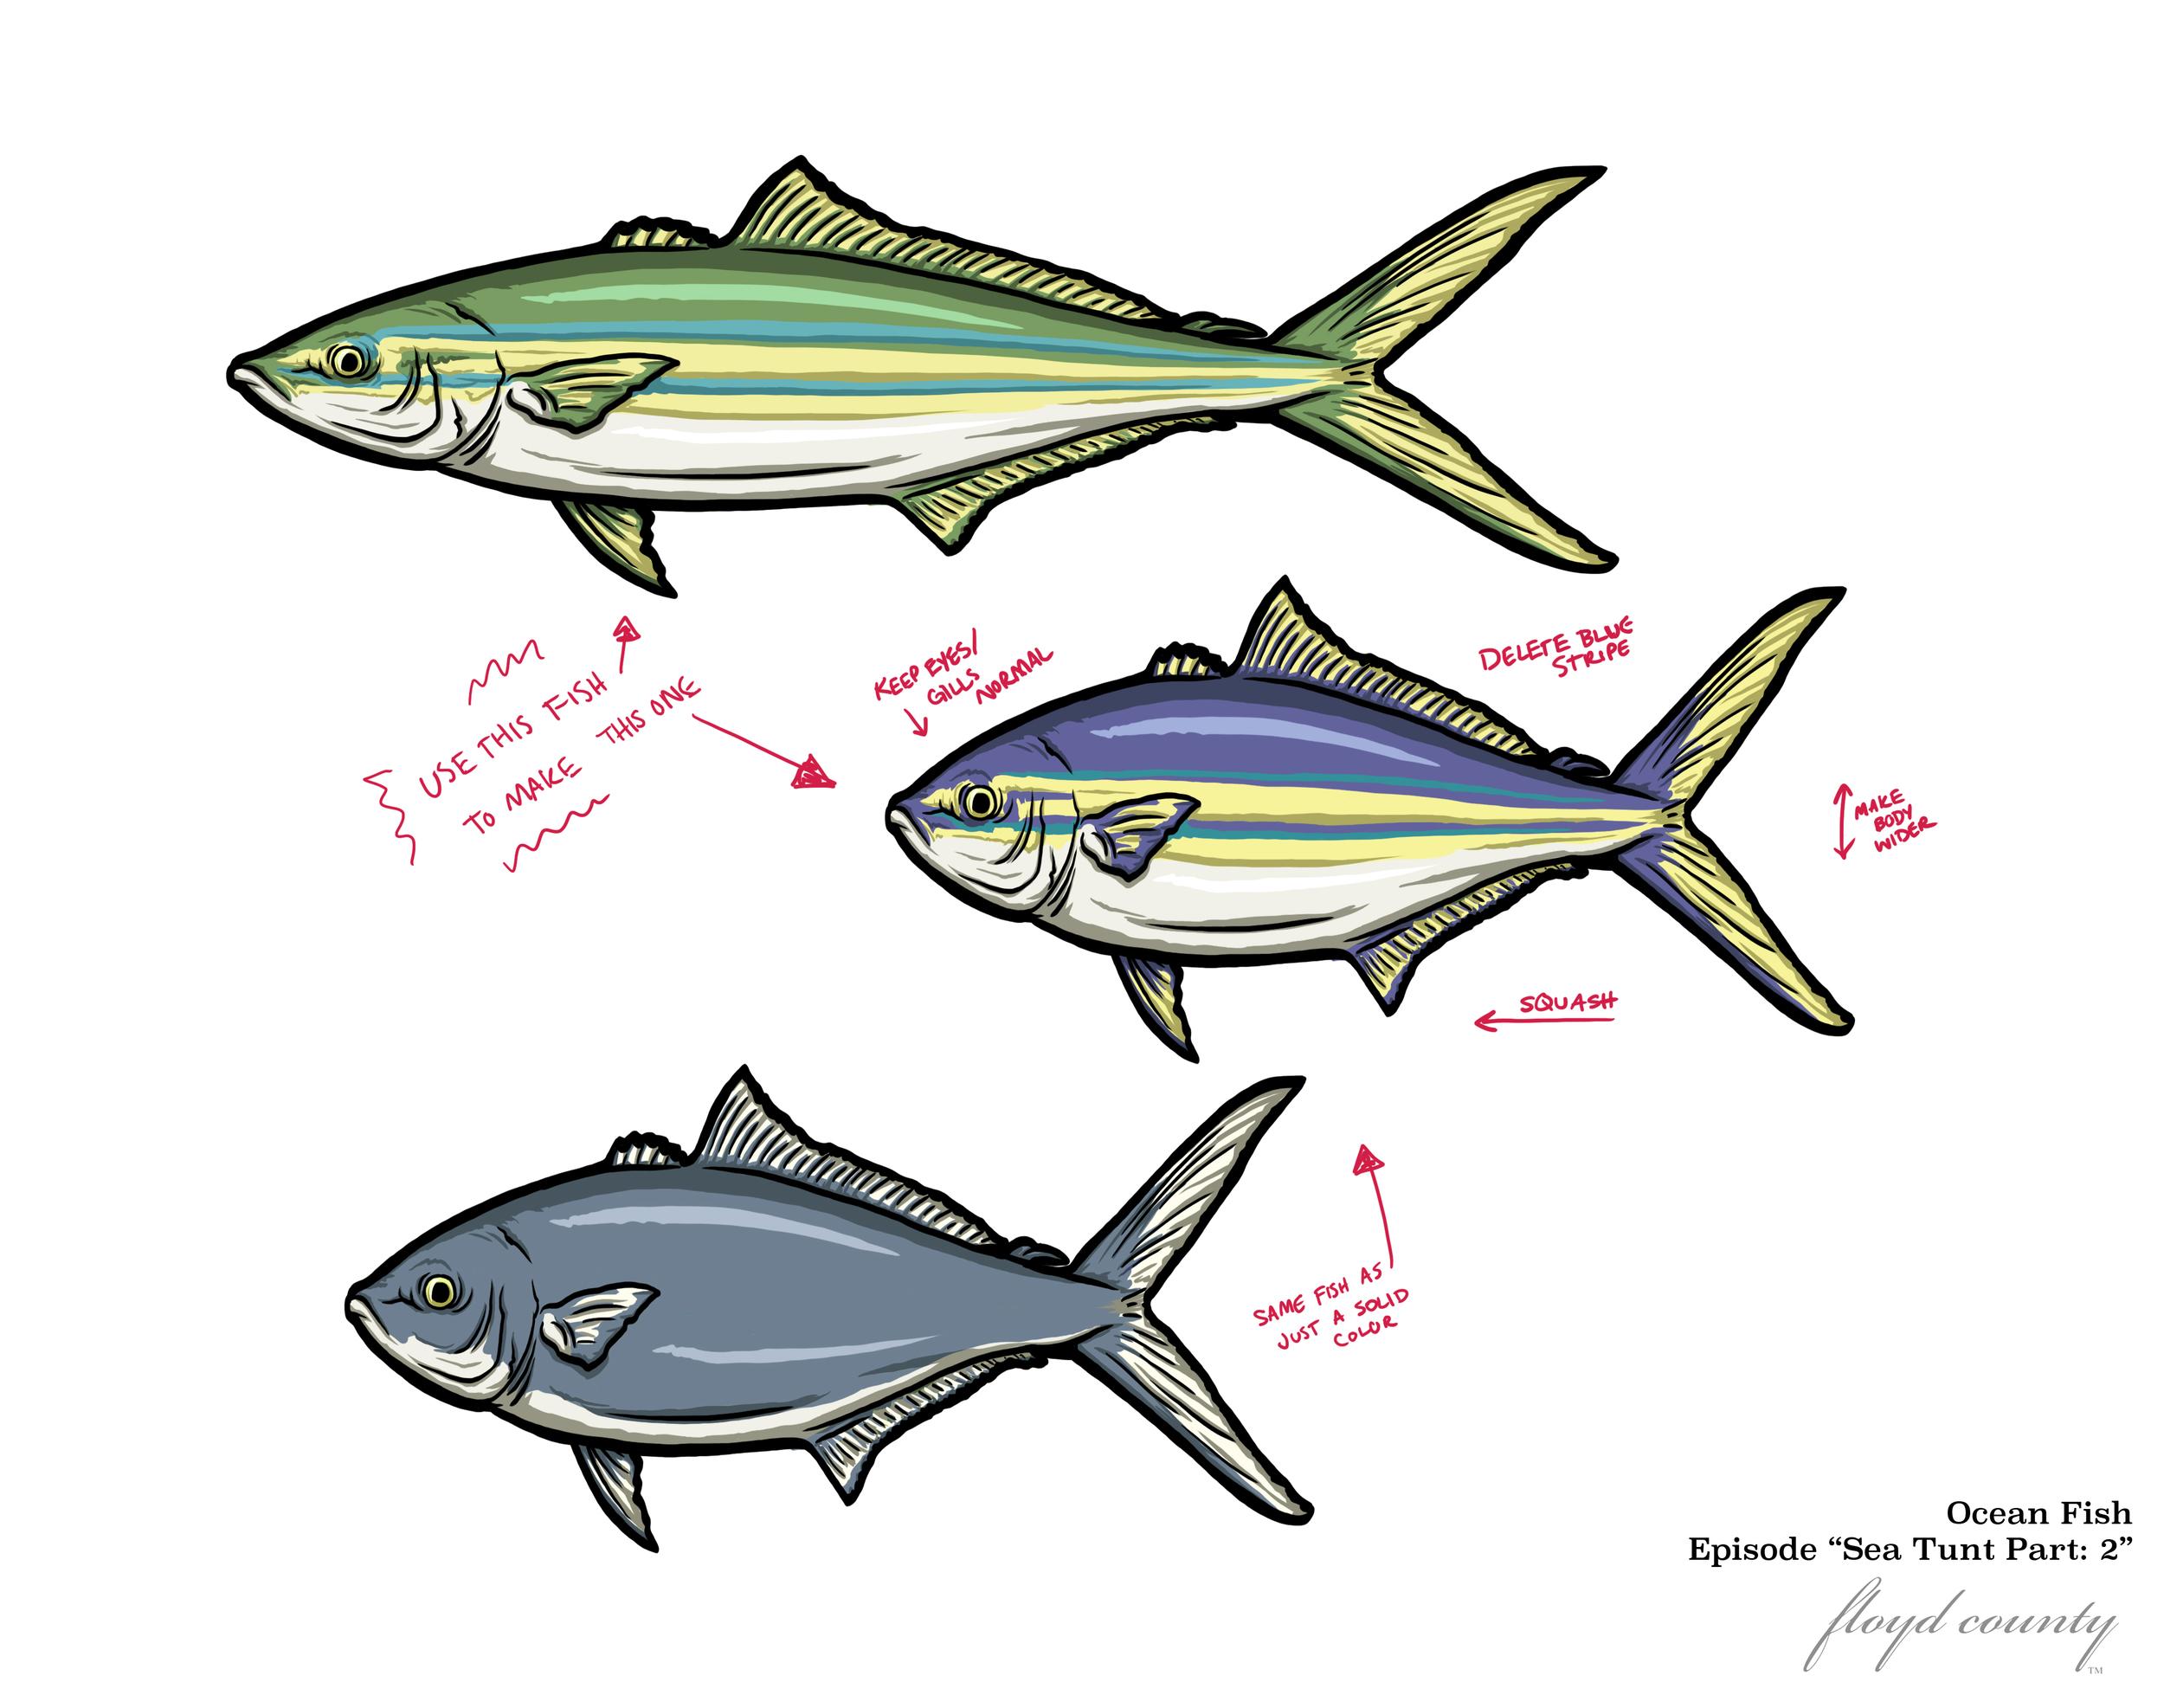 OceanFish.jpg